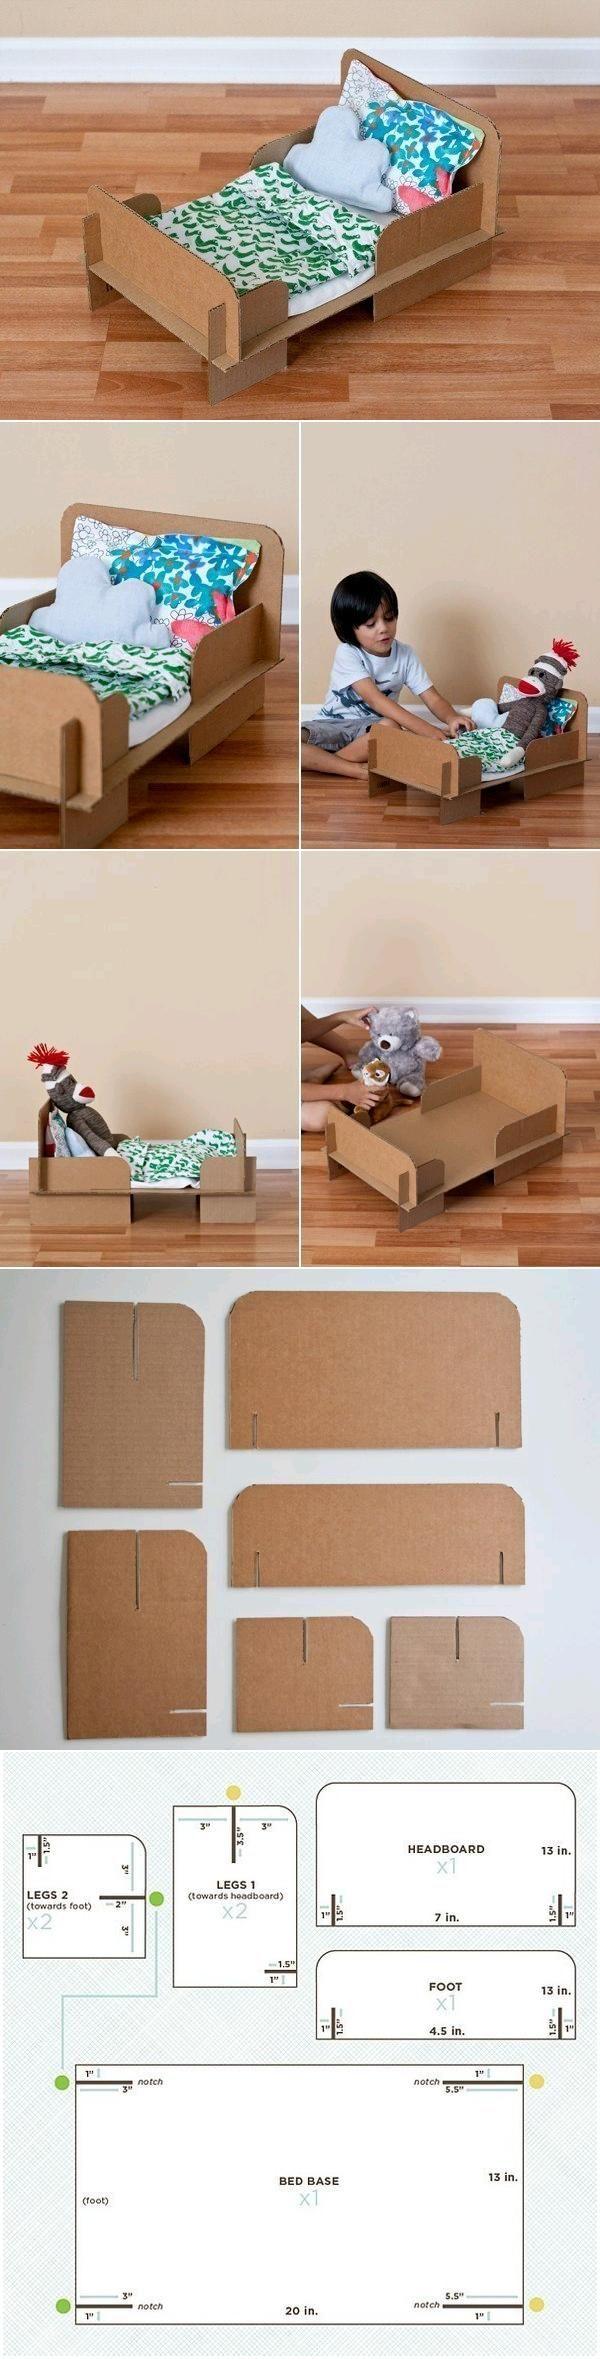 Tutorial cama cartón para muñecas